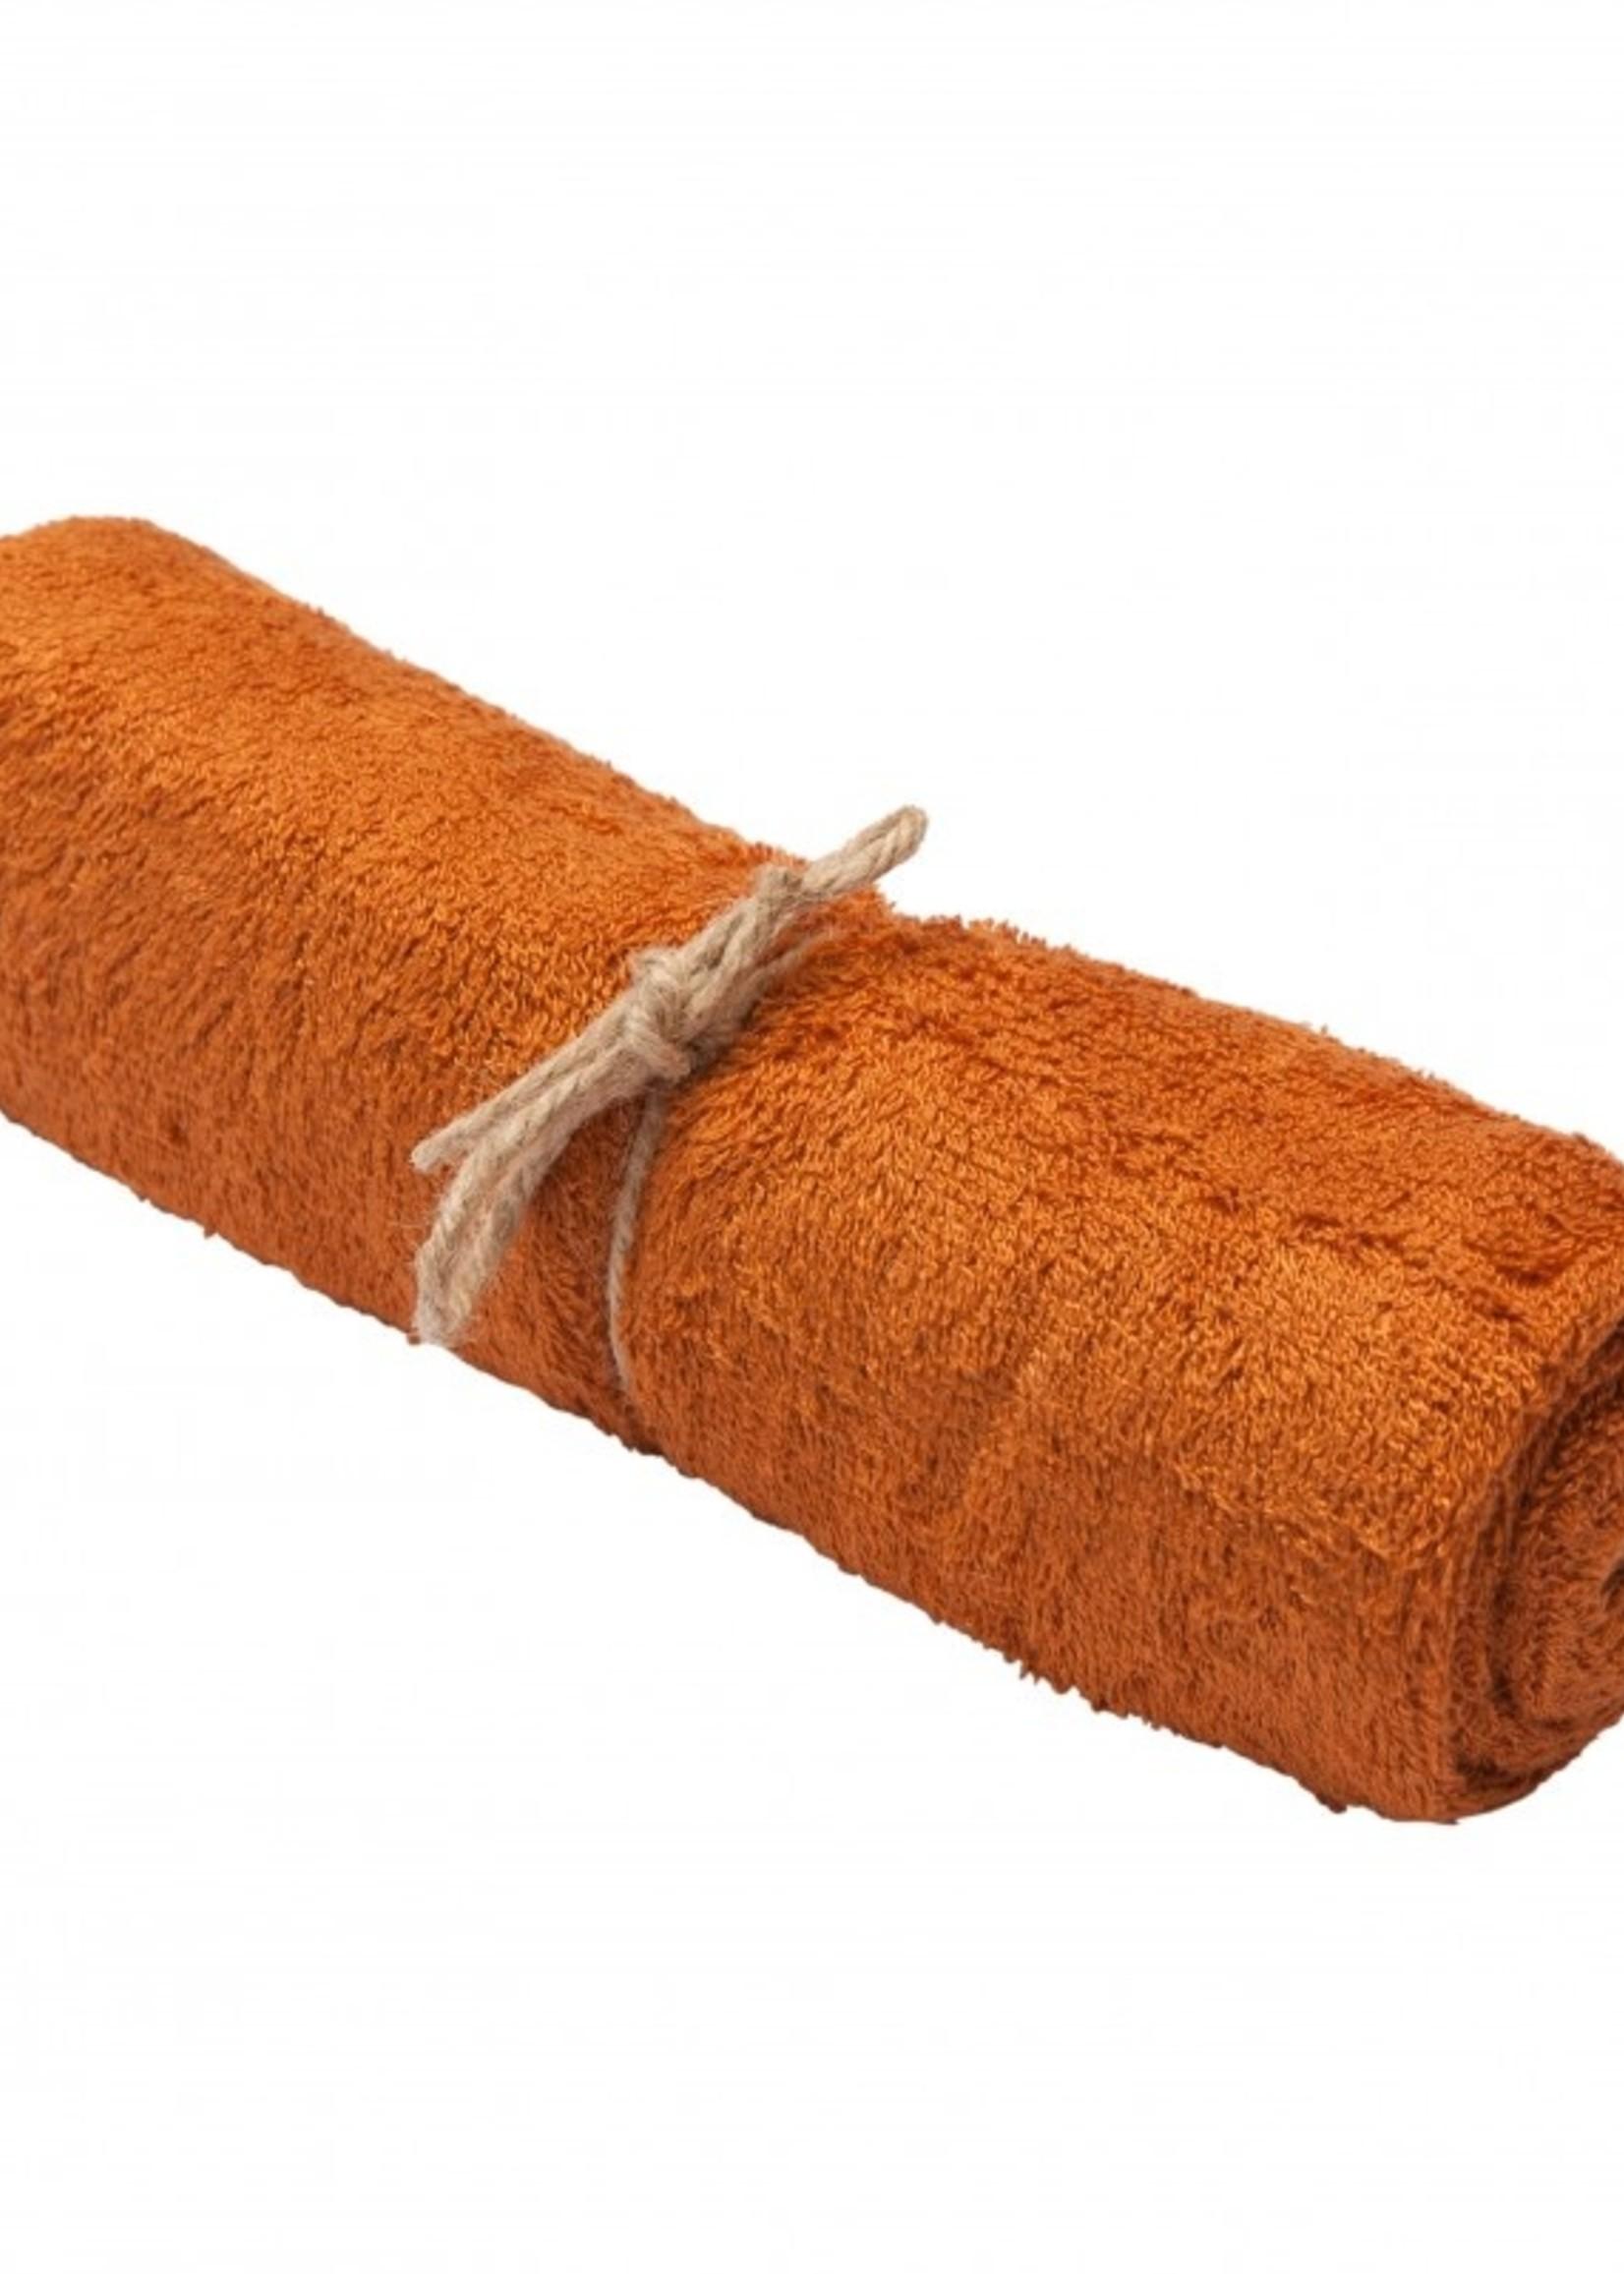 Timboo Towel 50x74 cm Inca Rust